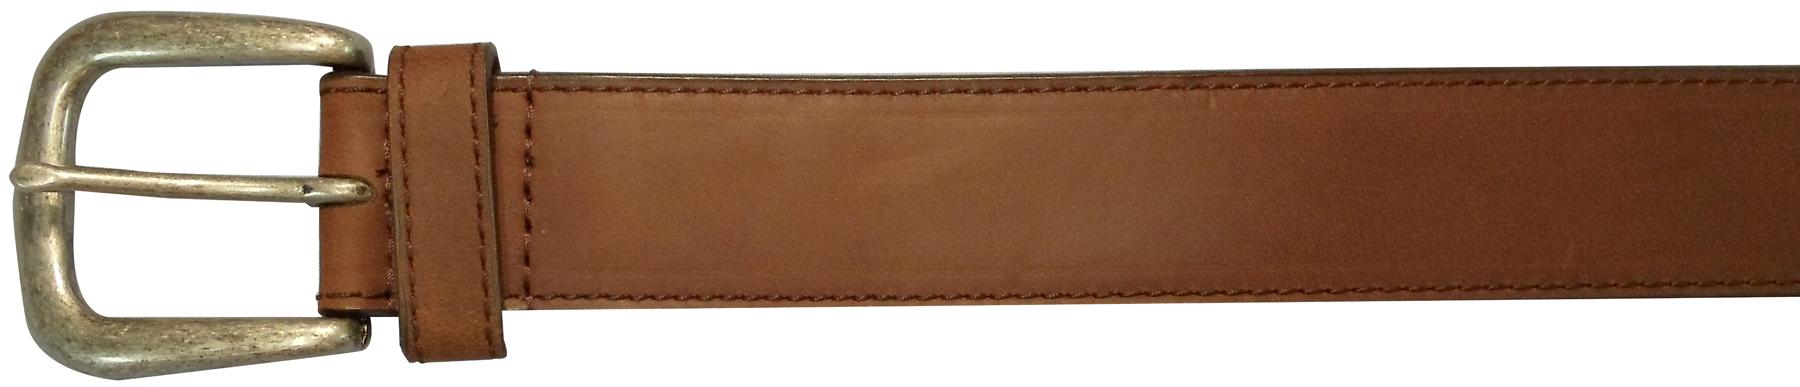 "10625410236 - 36"" Plain Brown Leather Field & Stream Belt"